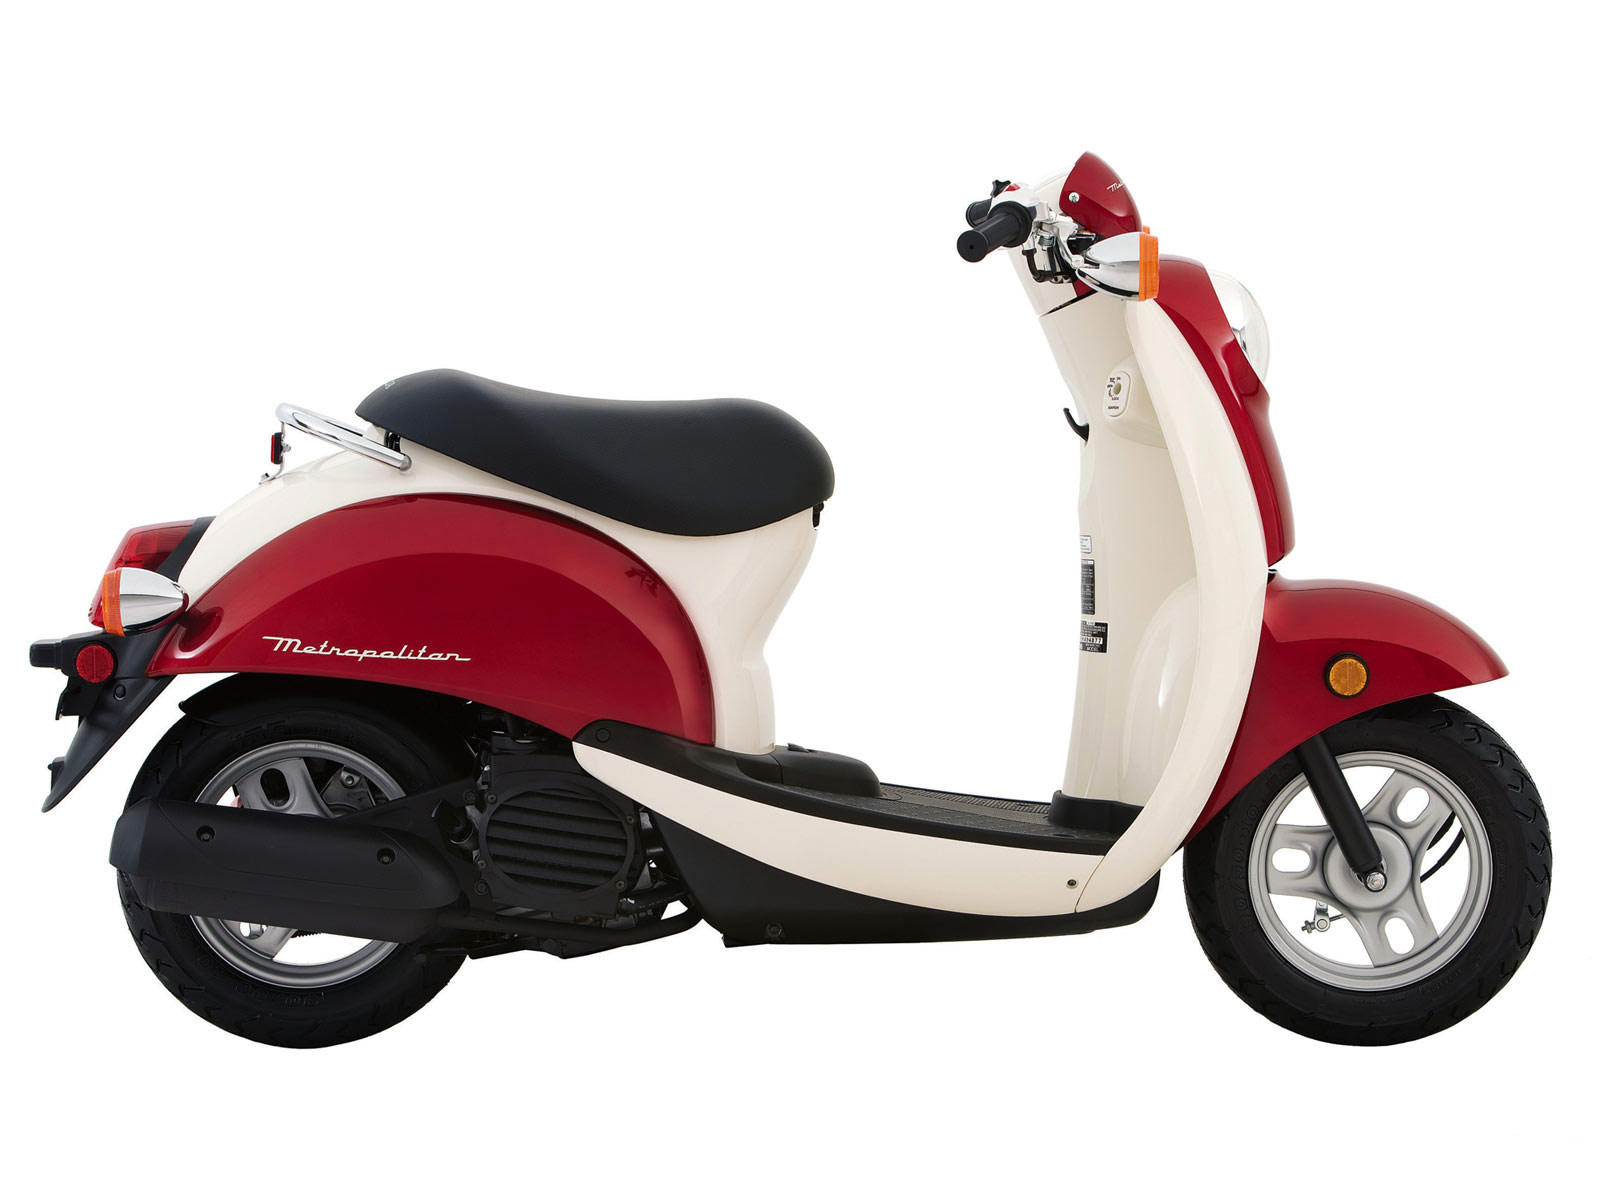 Spree moped 16